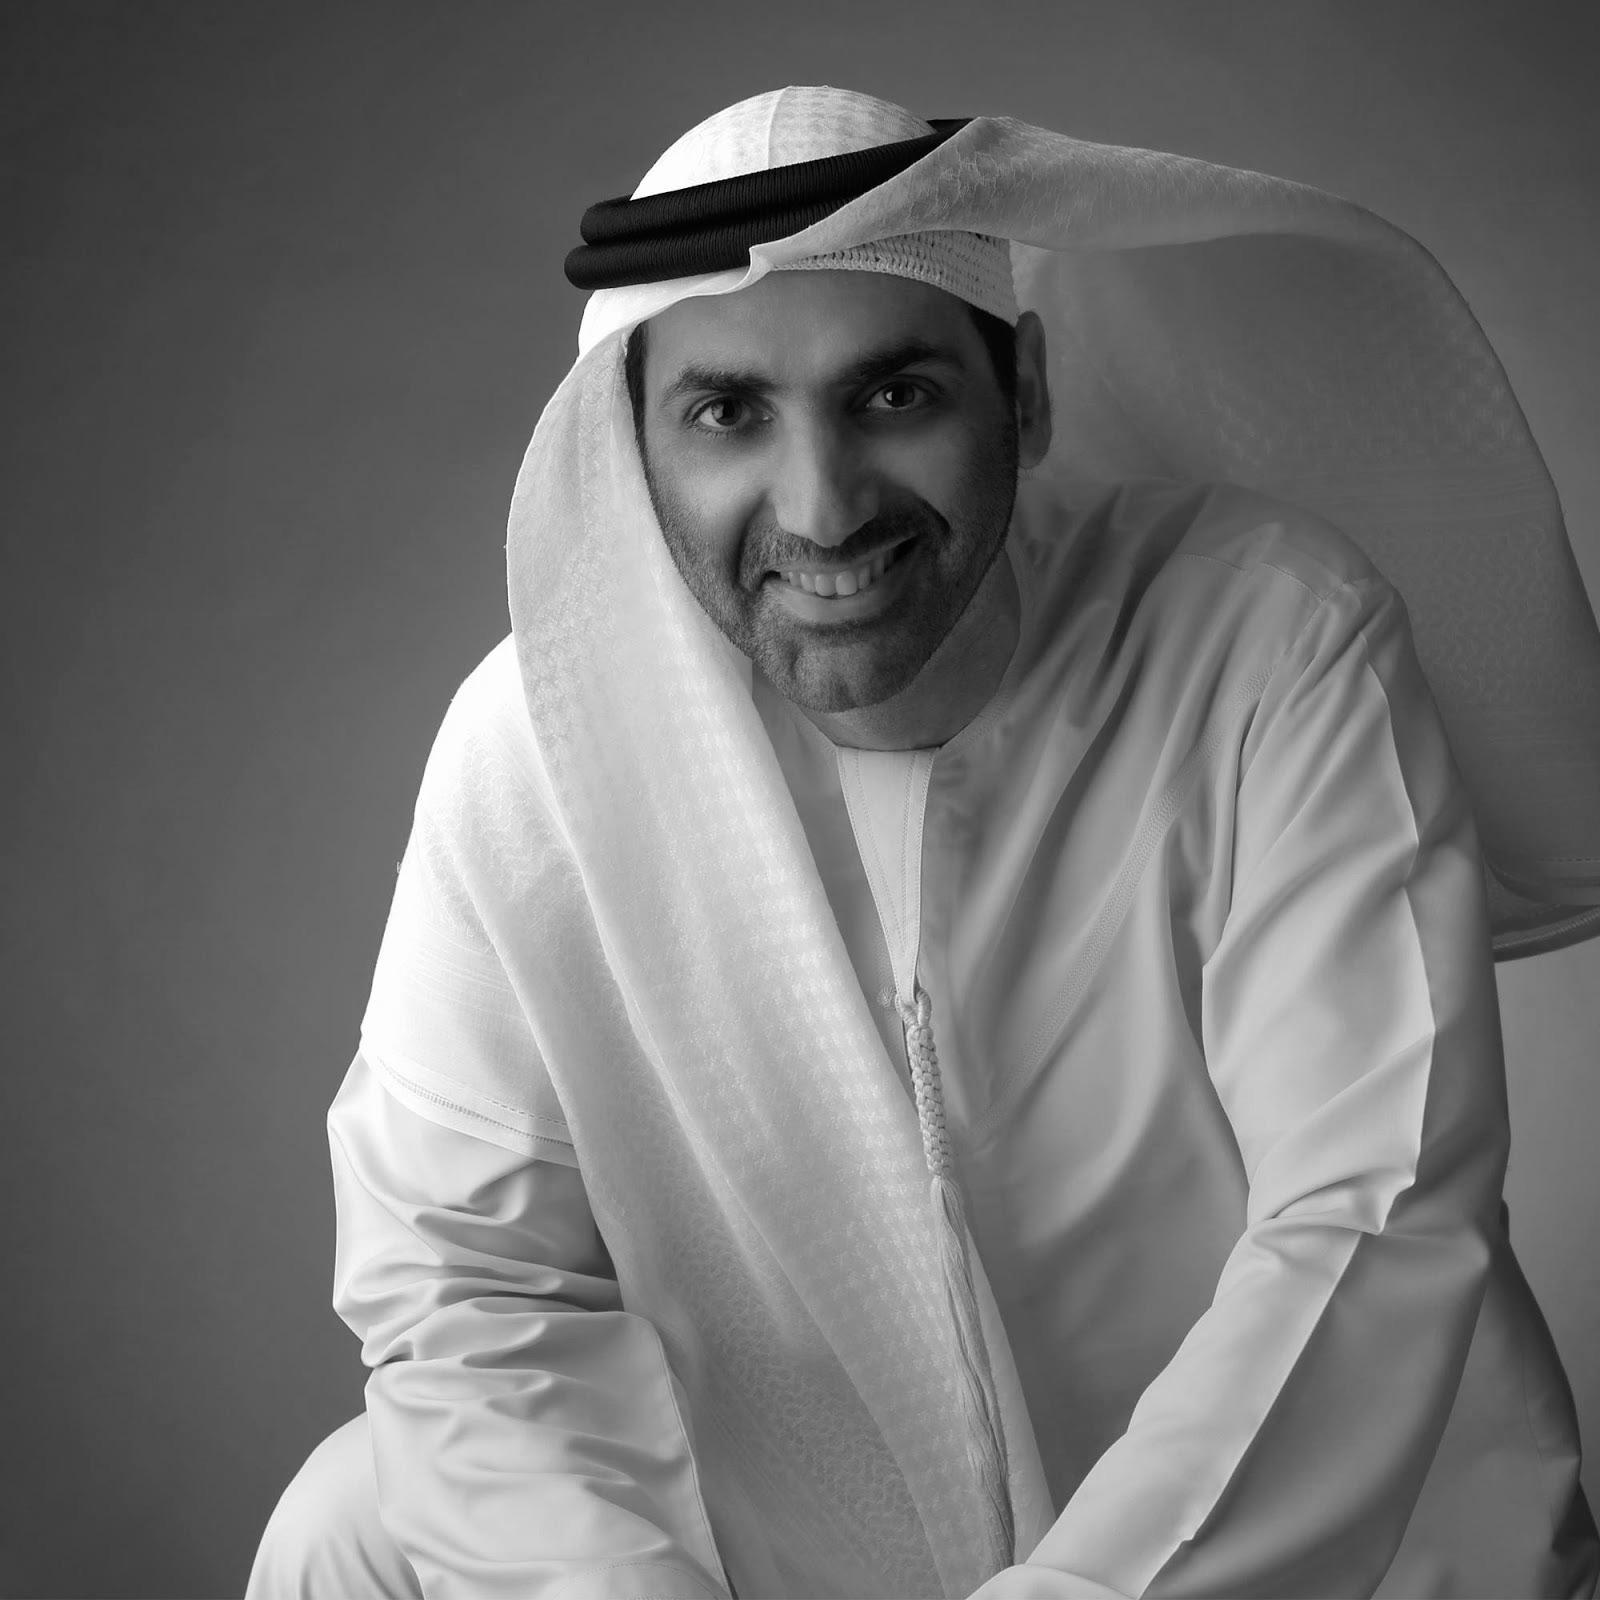 Sheikh Abdul Aziz meets with GLC